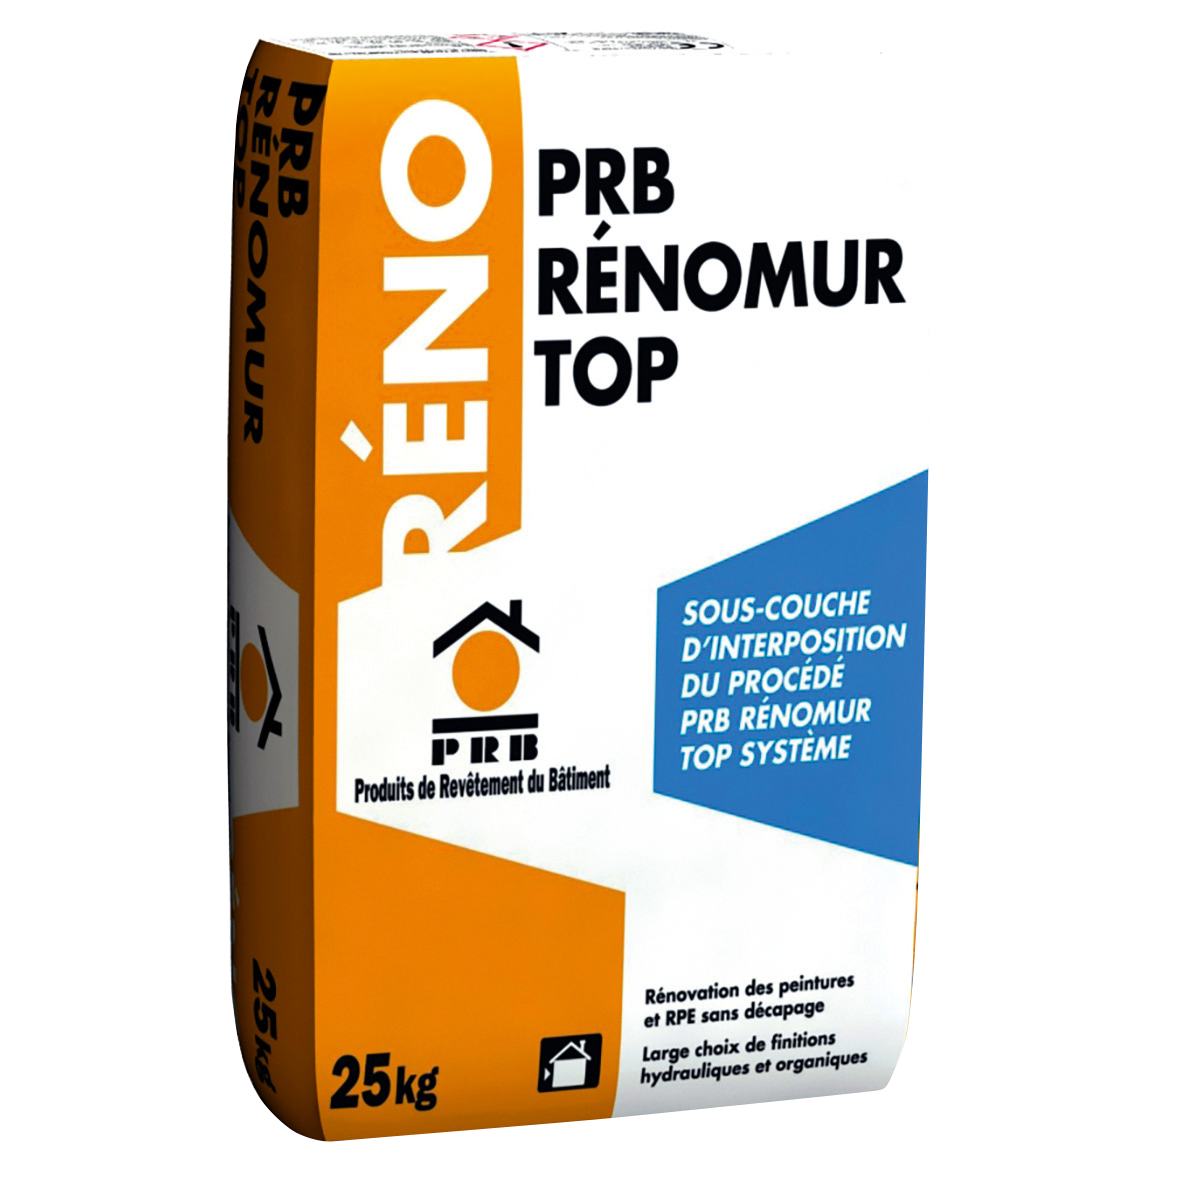 PRB RÉNOMUR TOP 25 KG